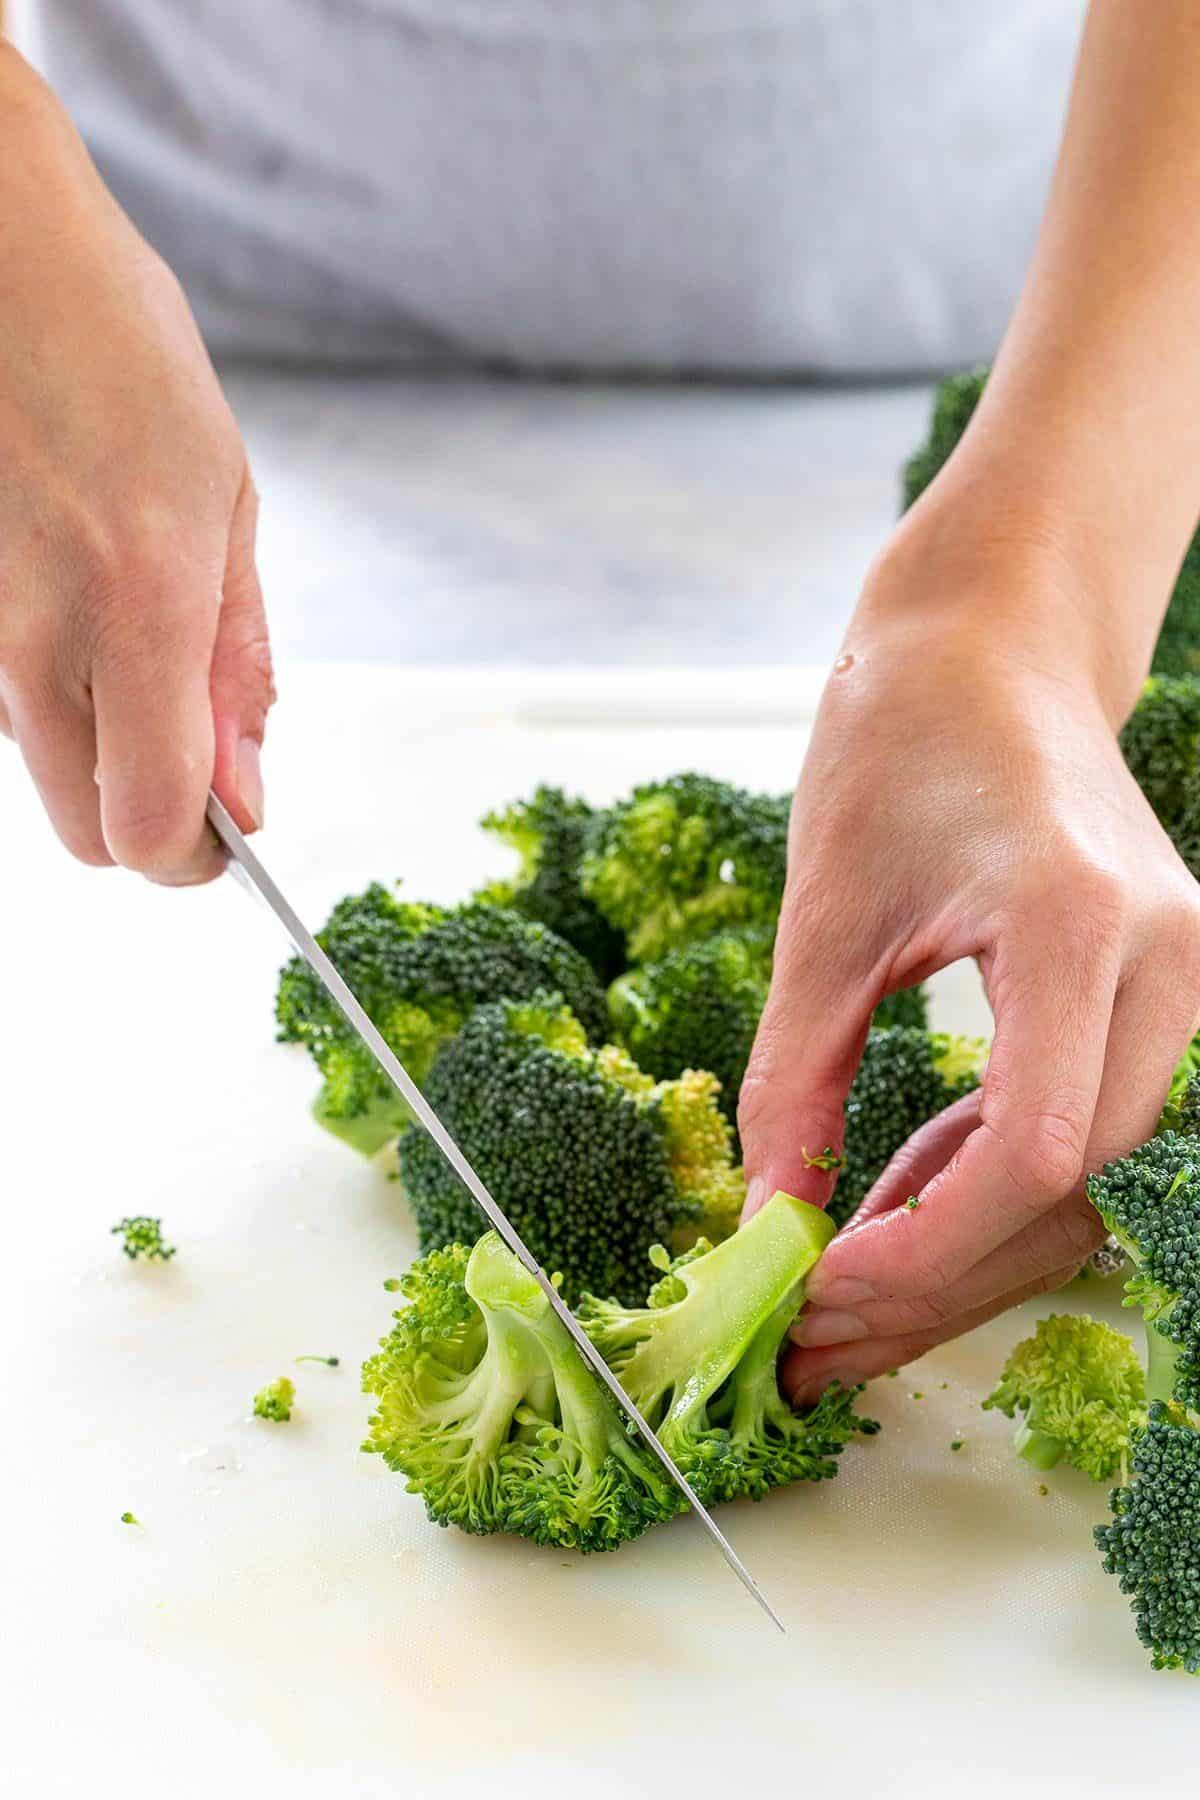 breaking down a head of broccoli